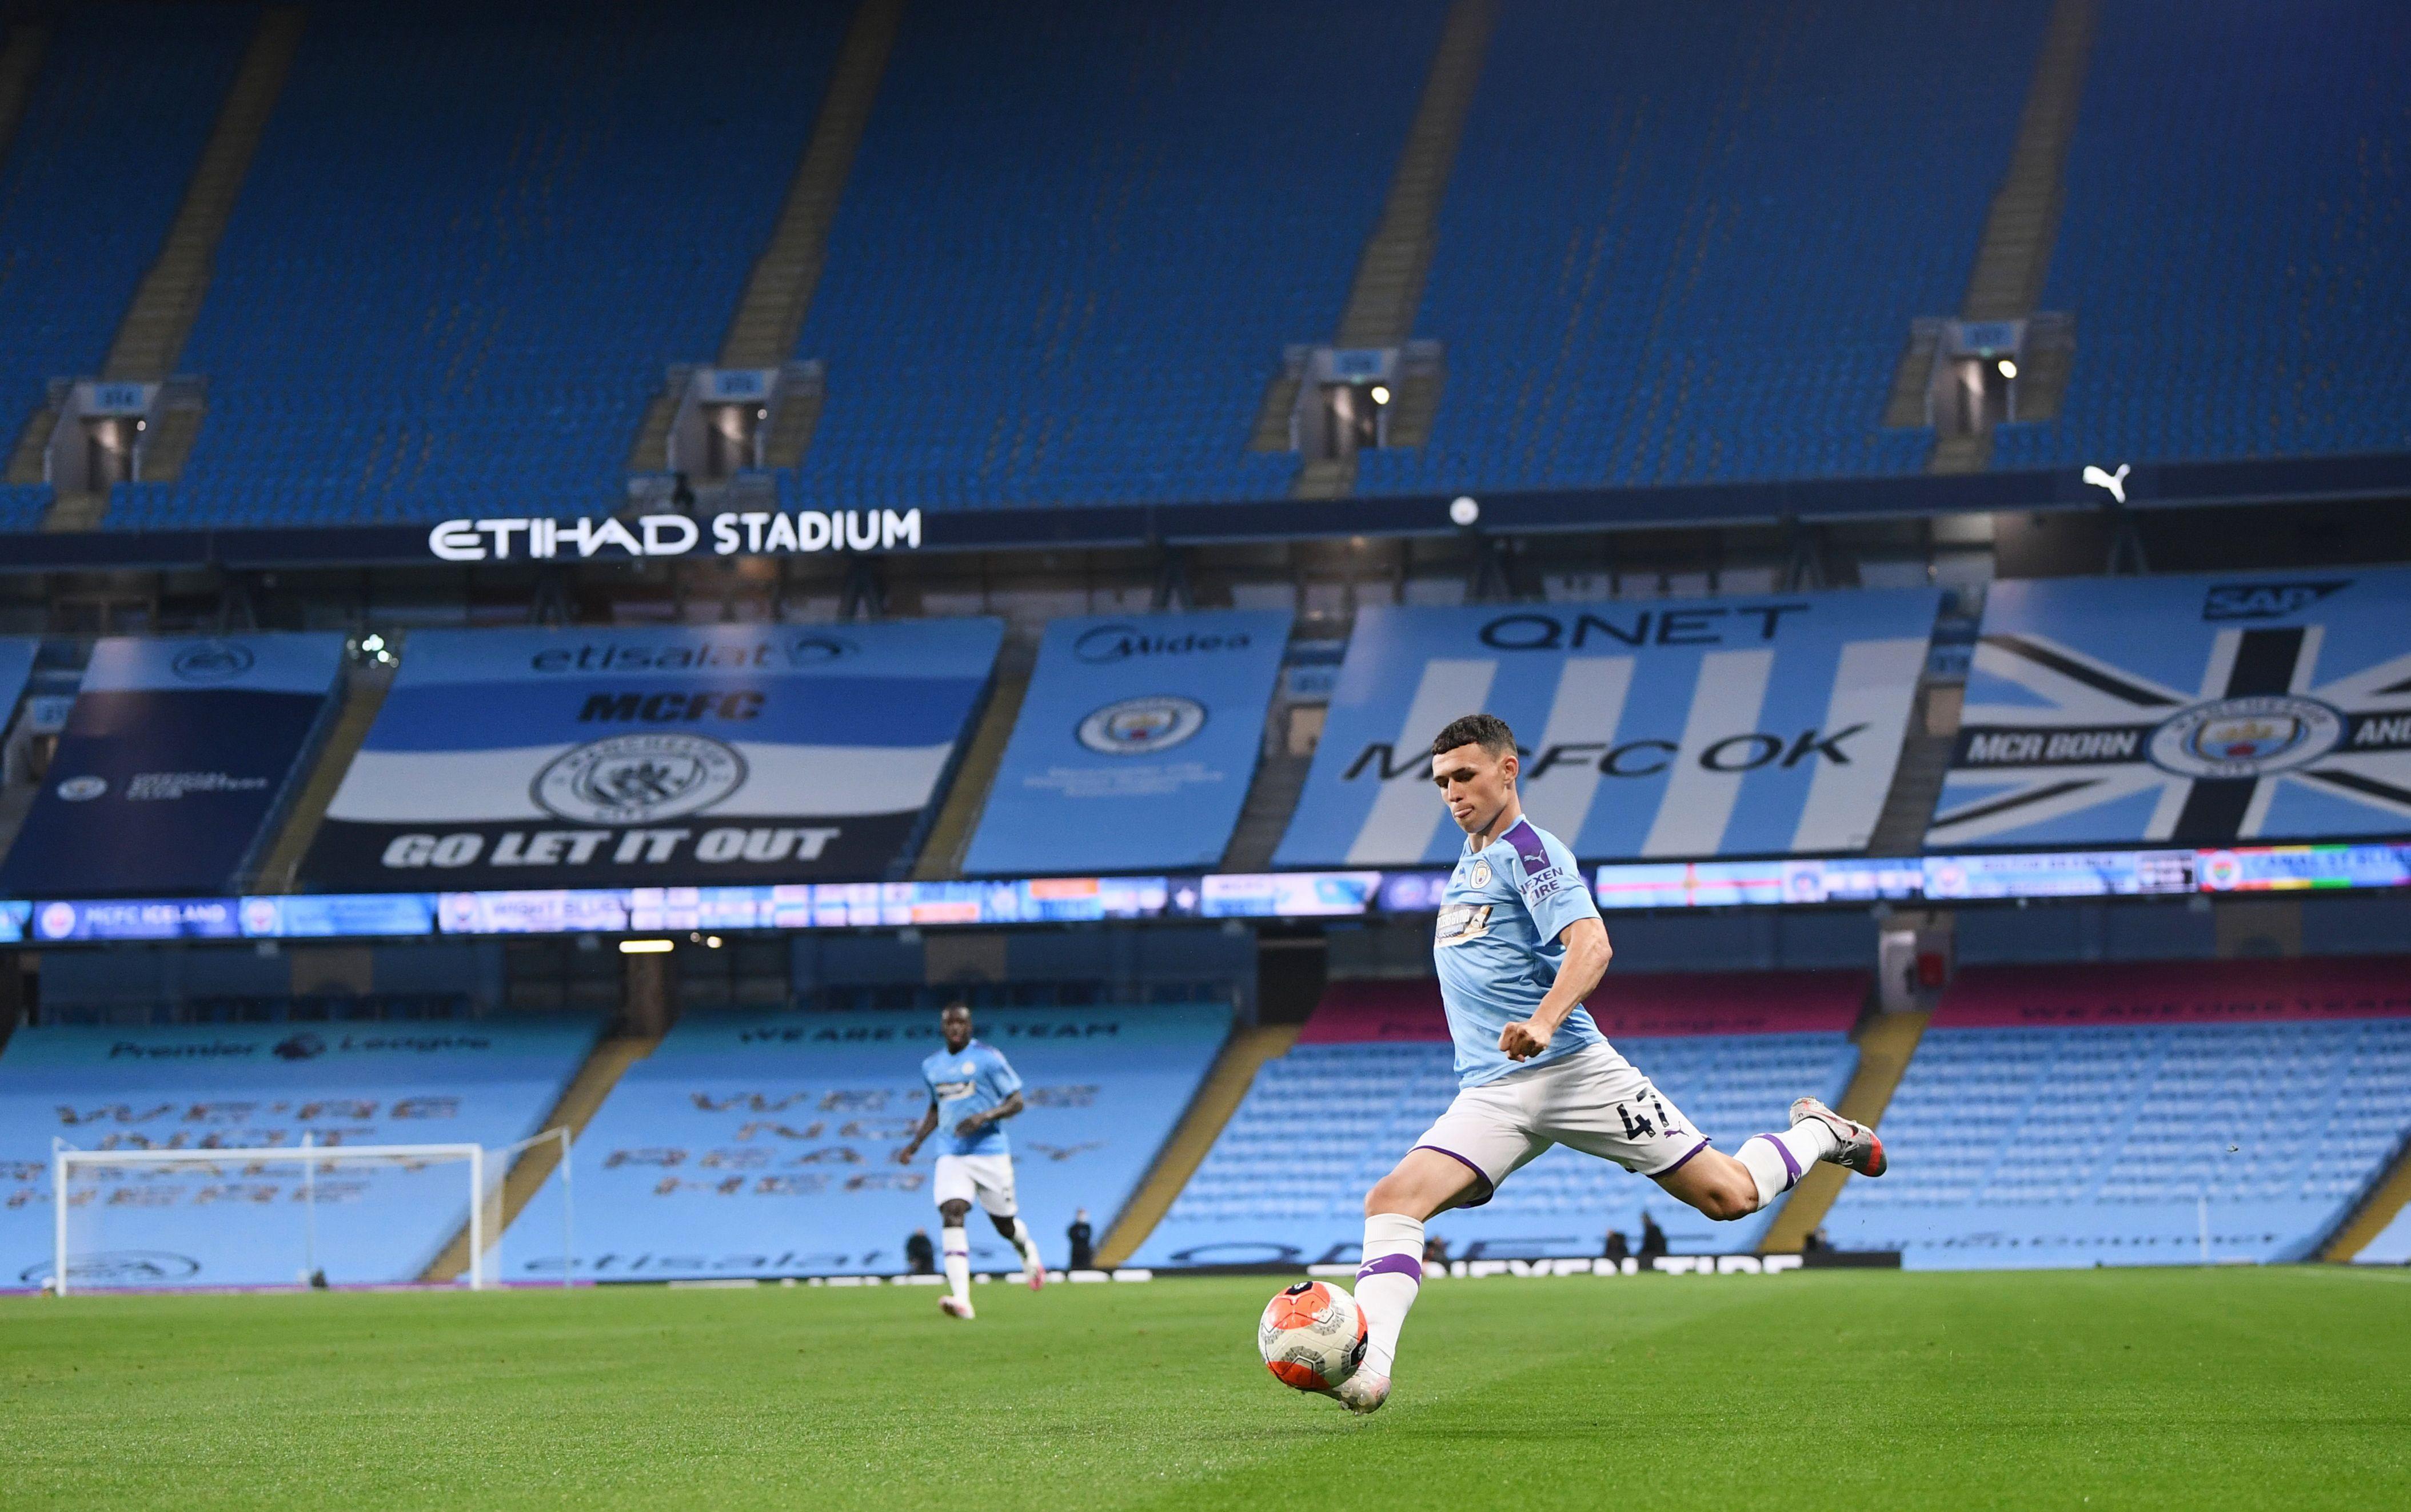 Football - Etranger - Premier League : Manchester City-Bournemouth en direct